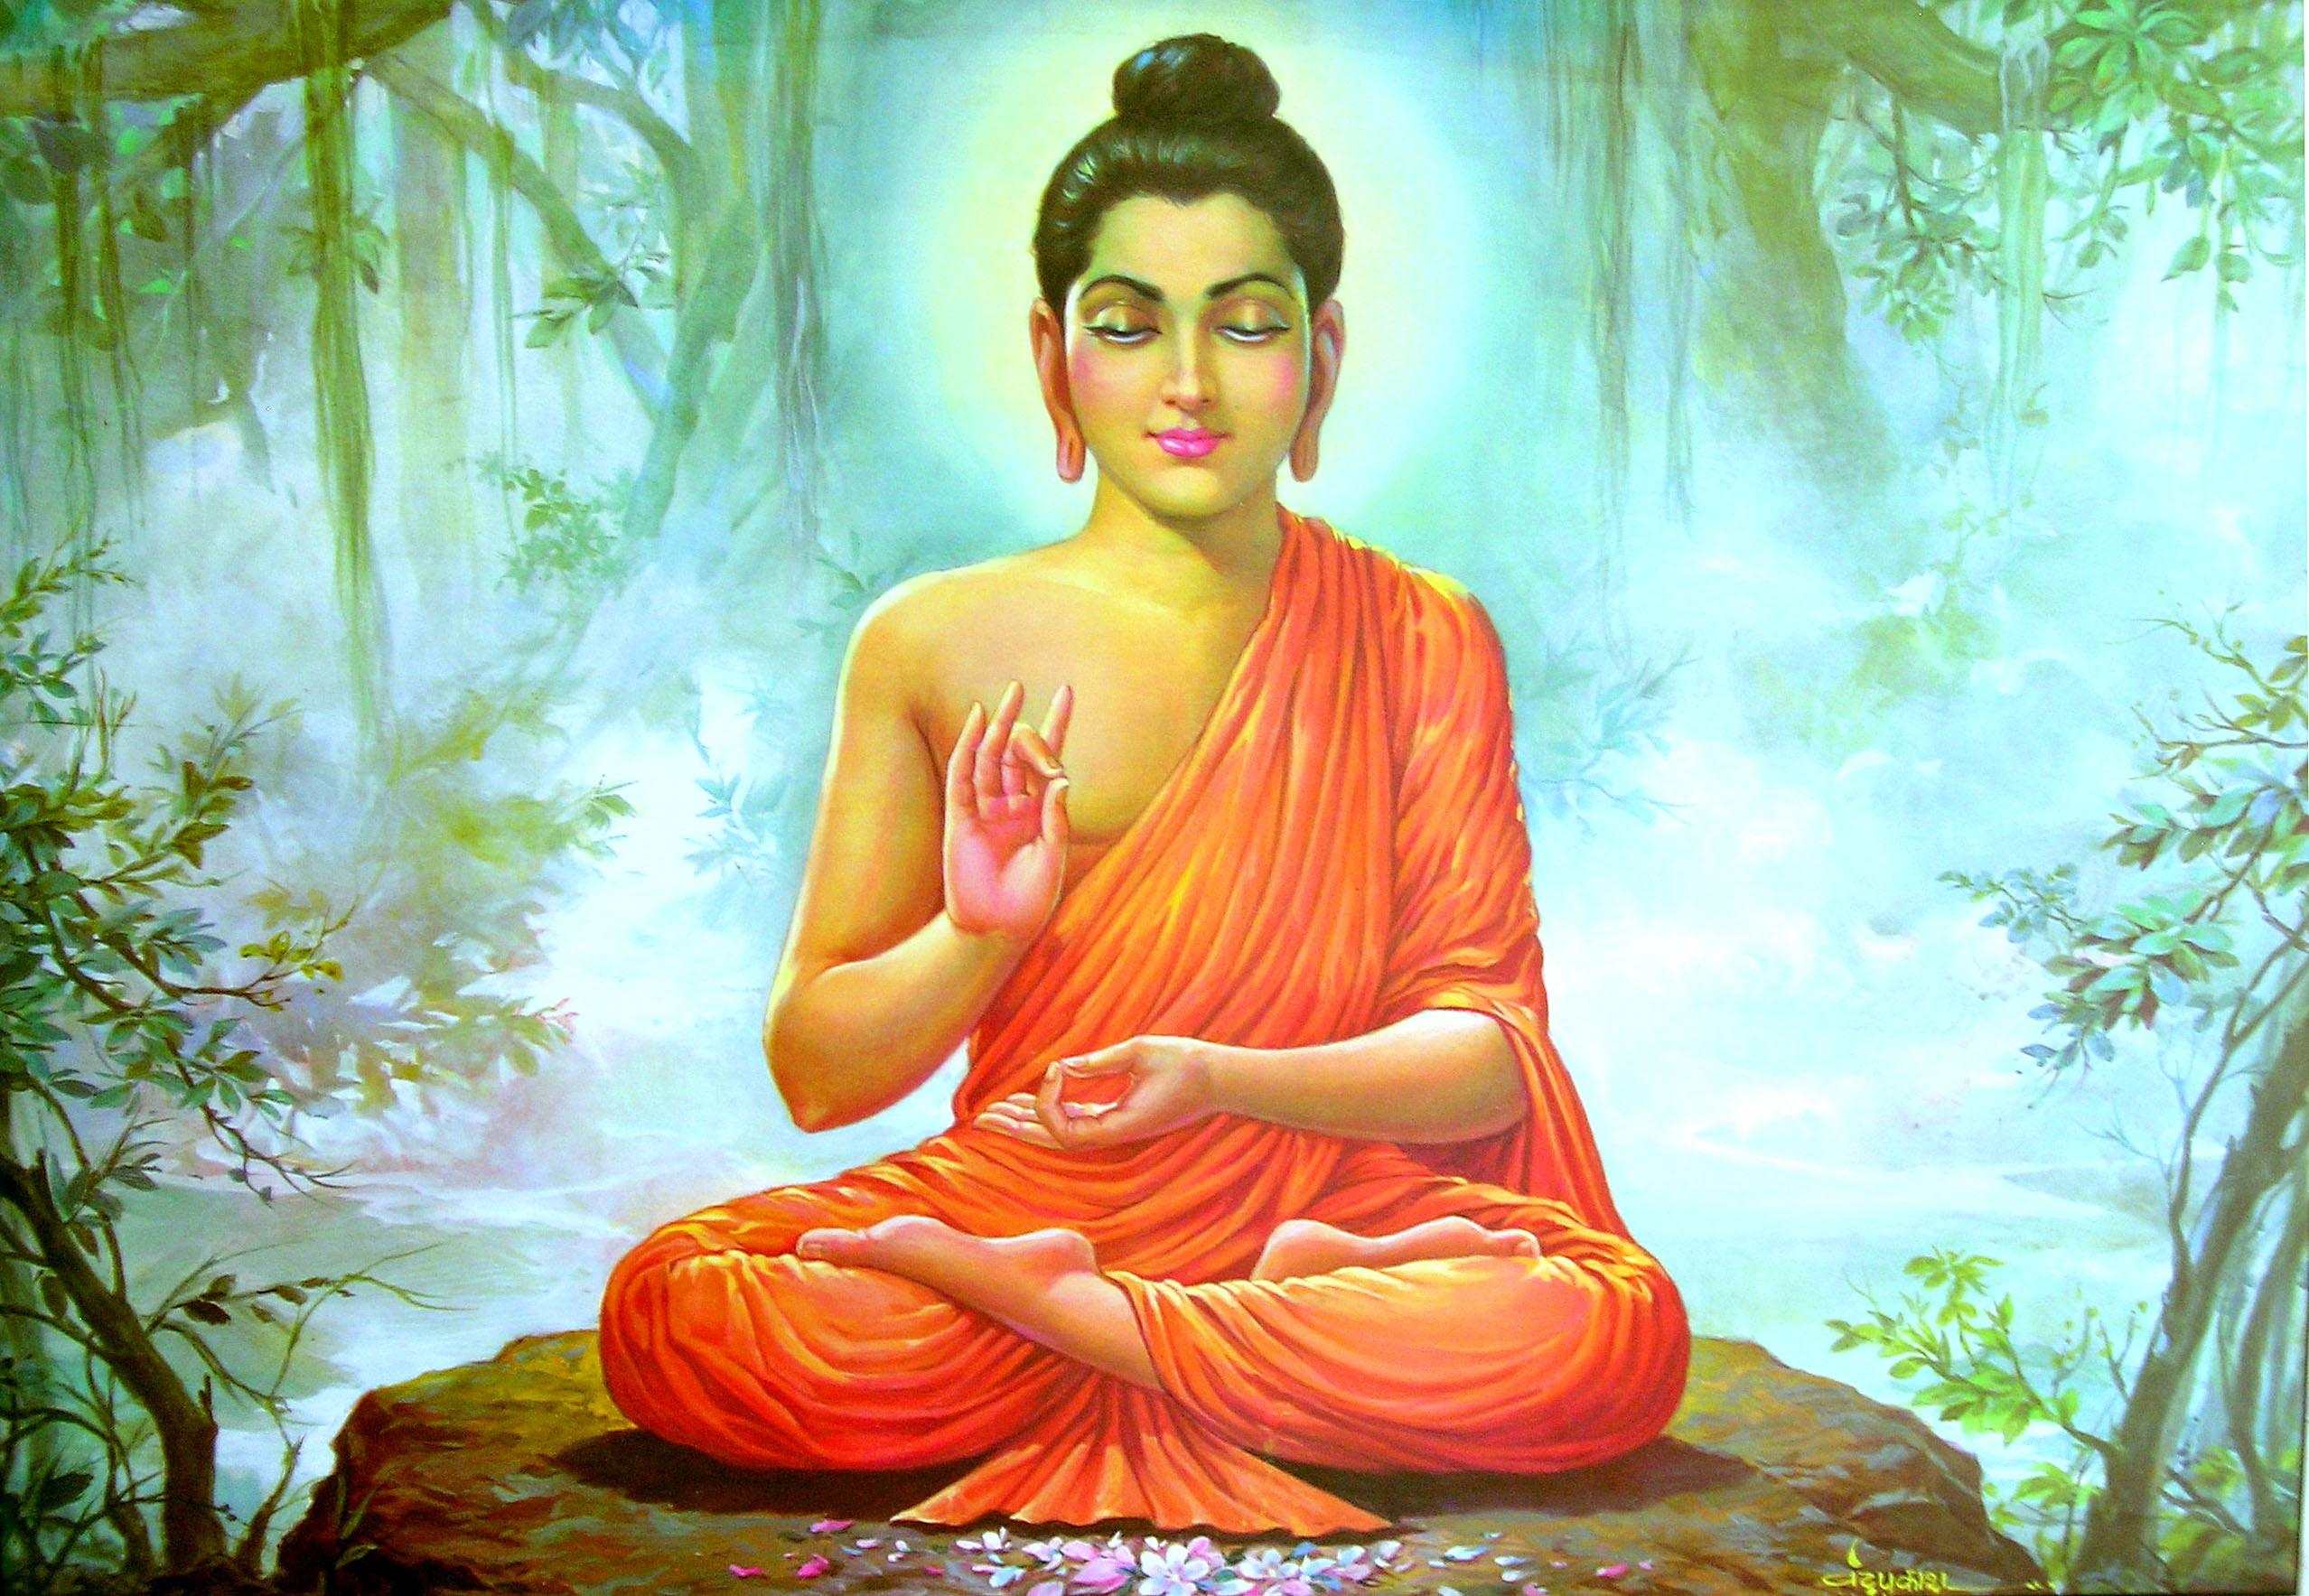 Lord buddha Images | Gautama Buddha | Lord Buddha pictures ...